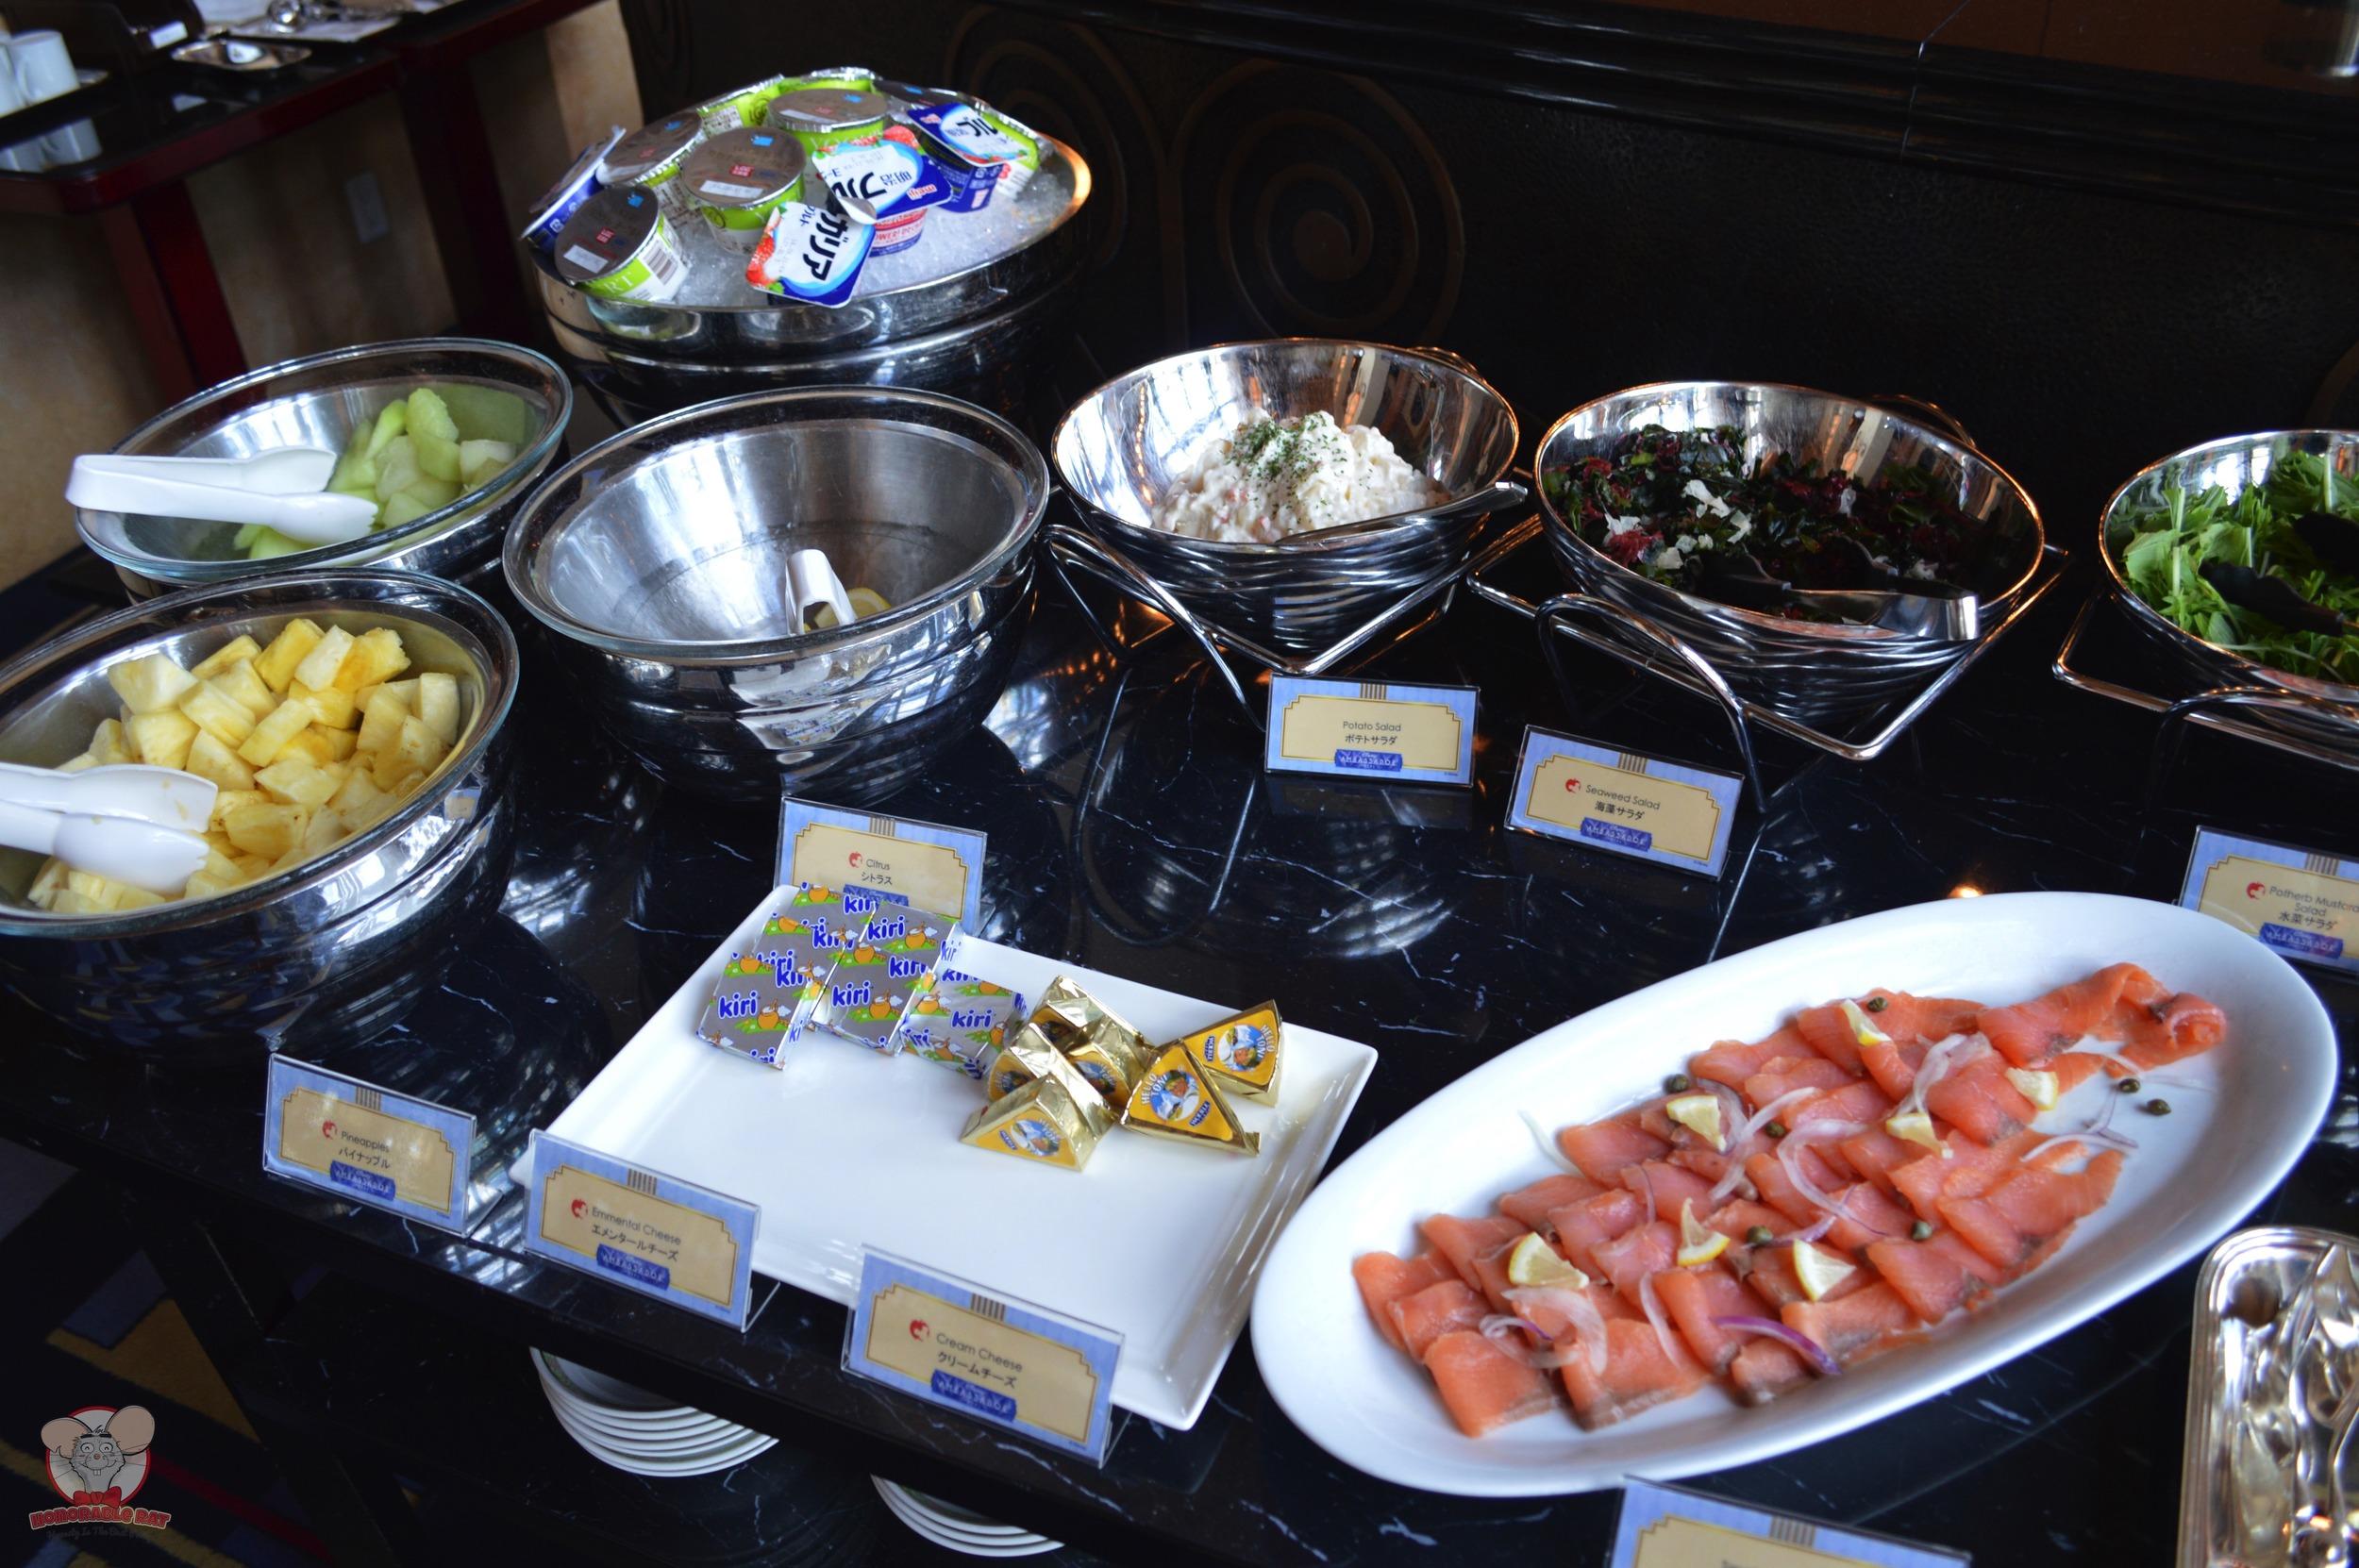 Fruits, yogurt, salad, cheese and salmon